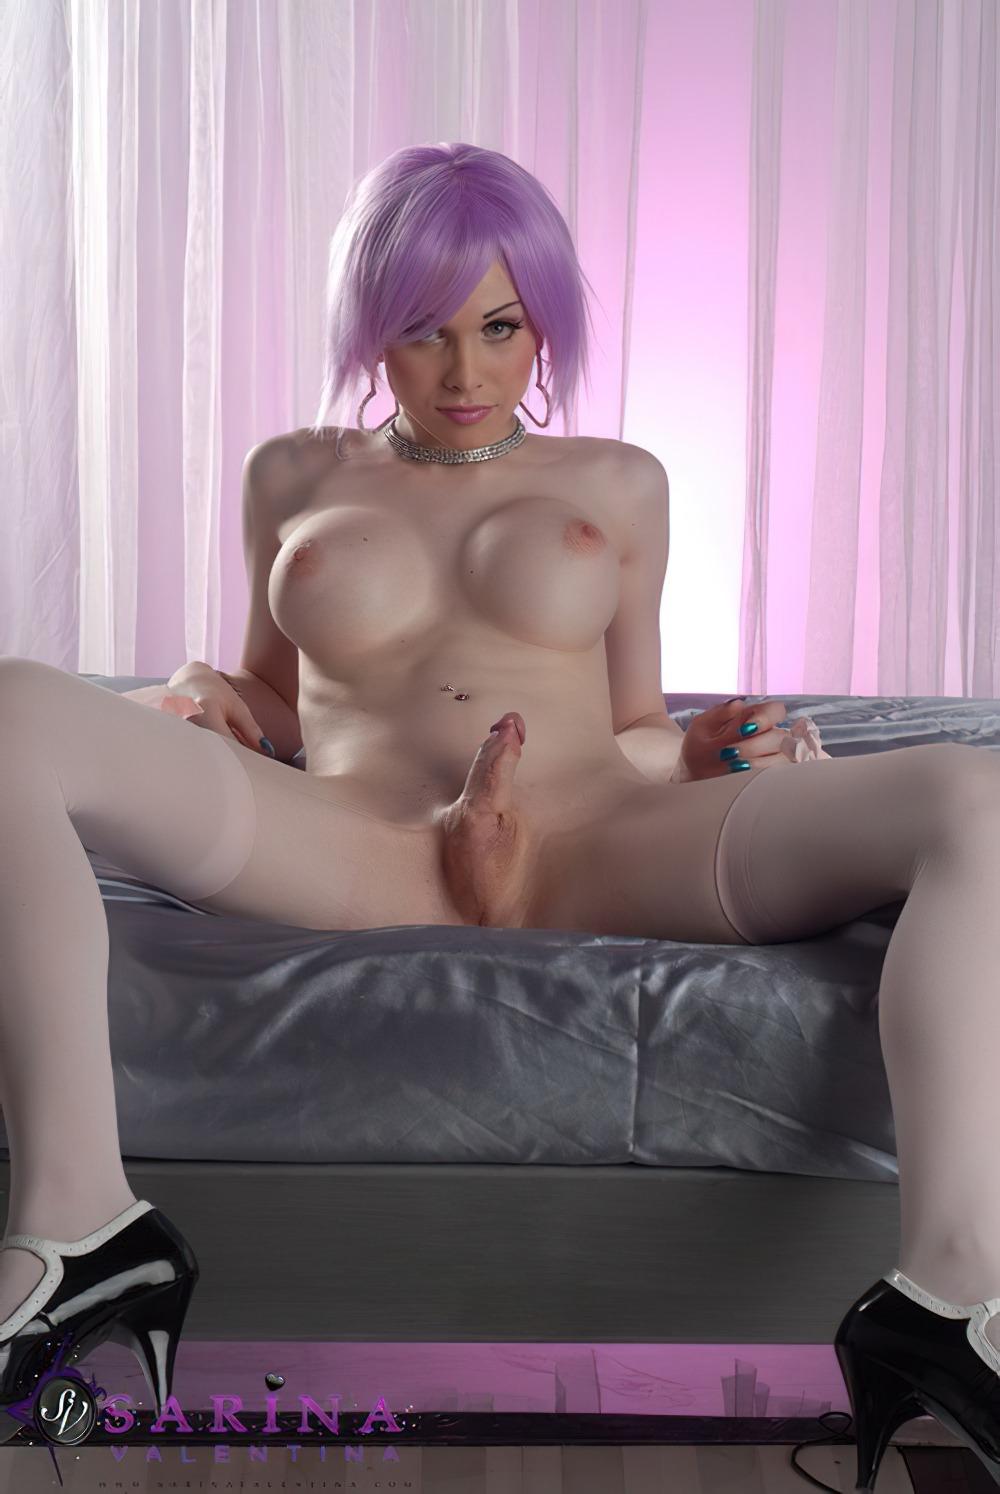 Cabelo Púrpura